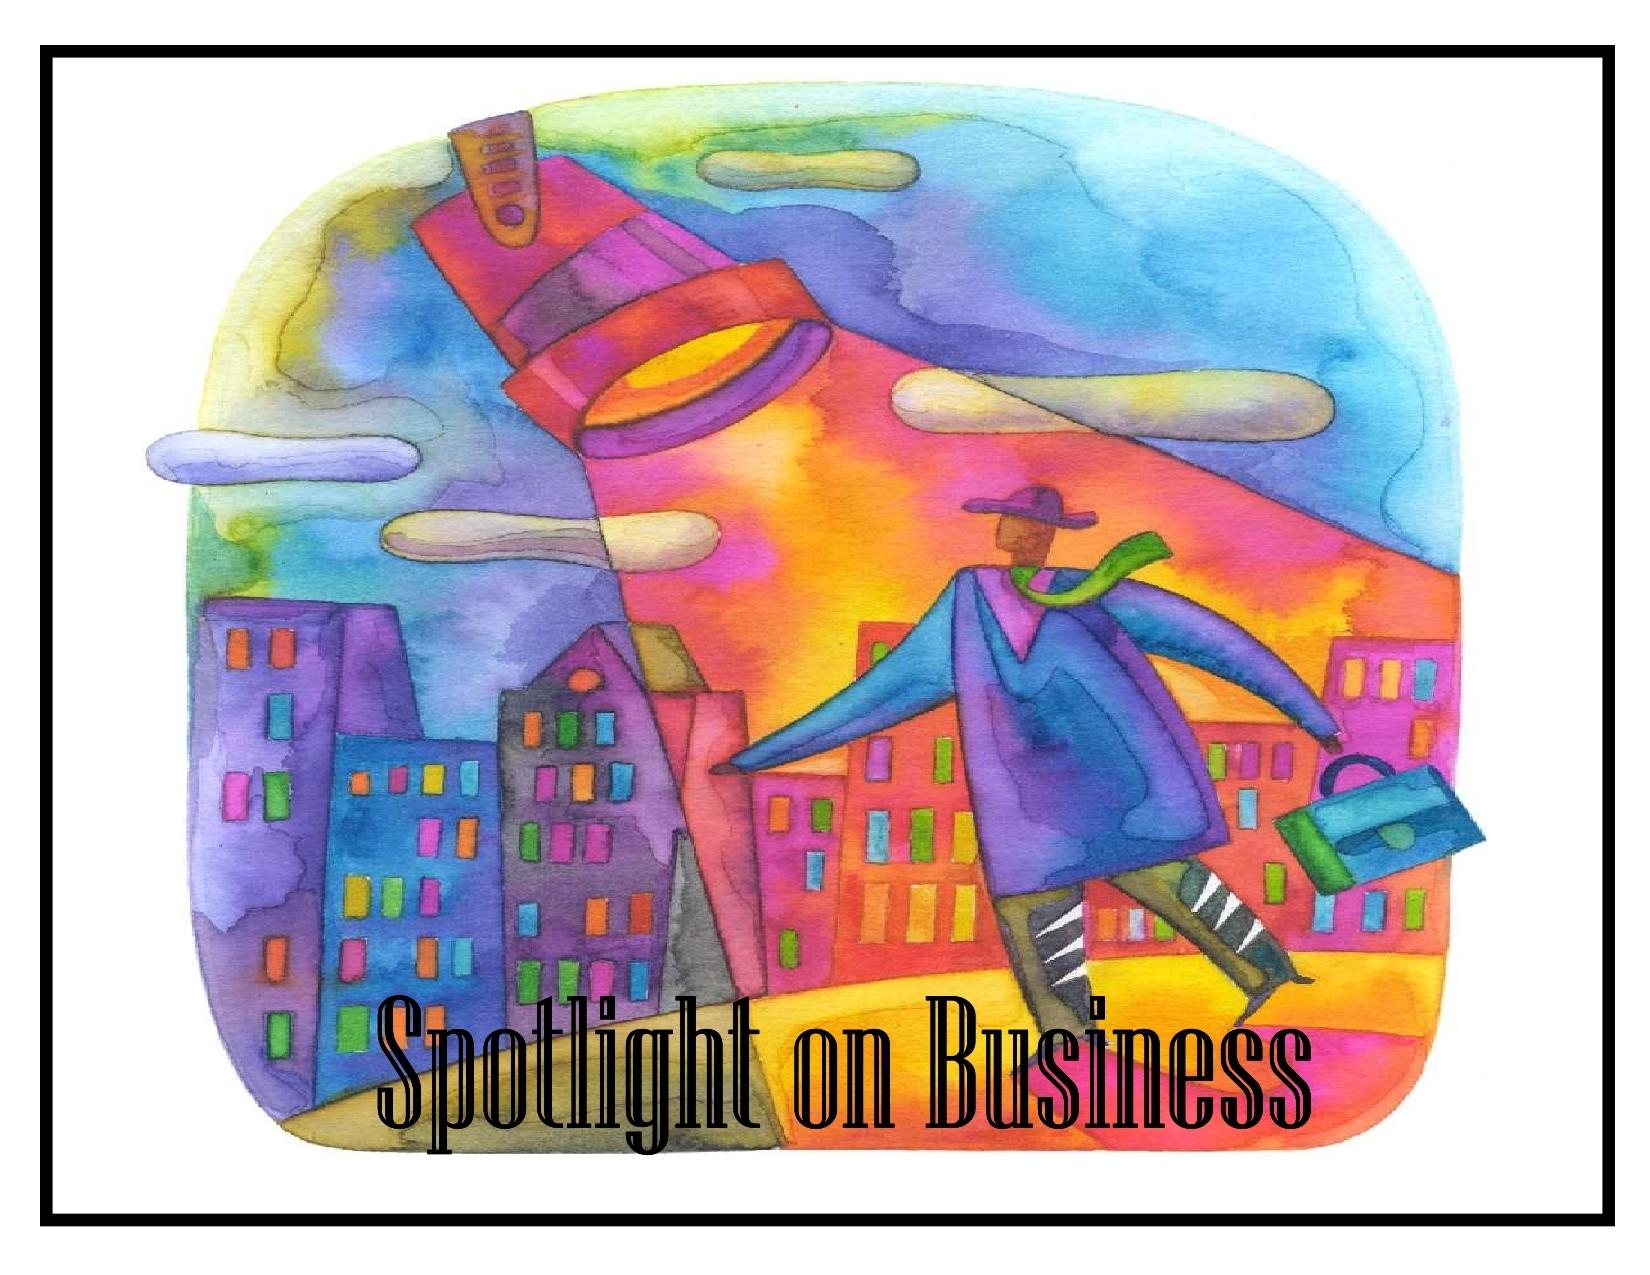 56196d97455f9c6cdfc9_spotlight_on_business_graphic.jpg